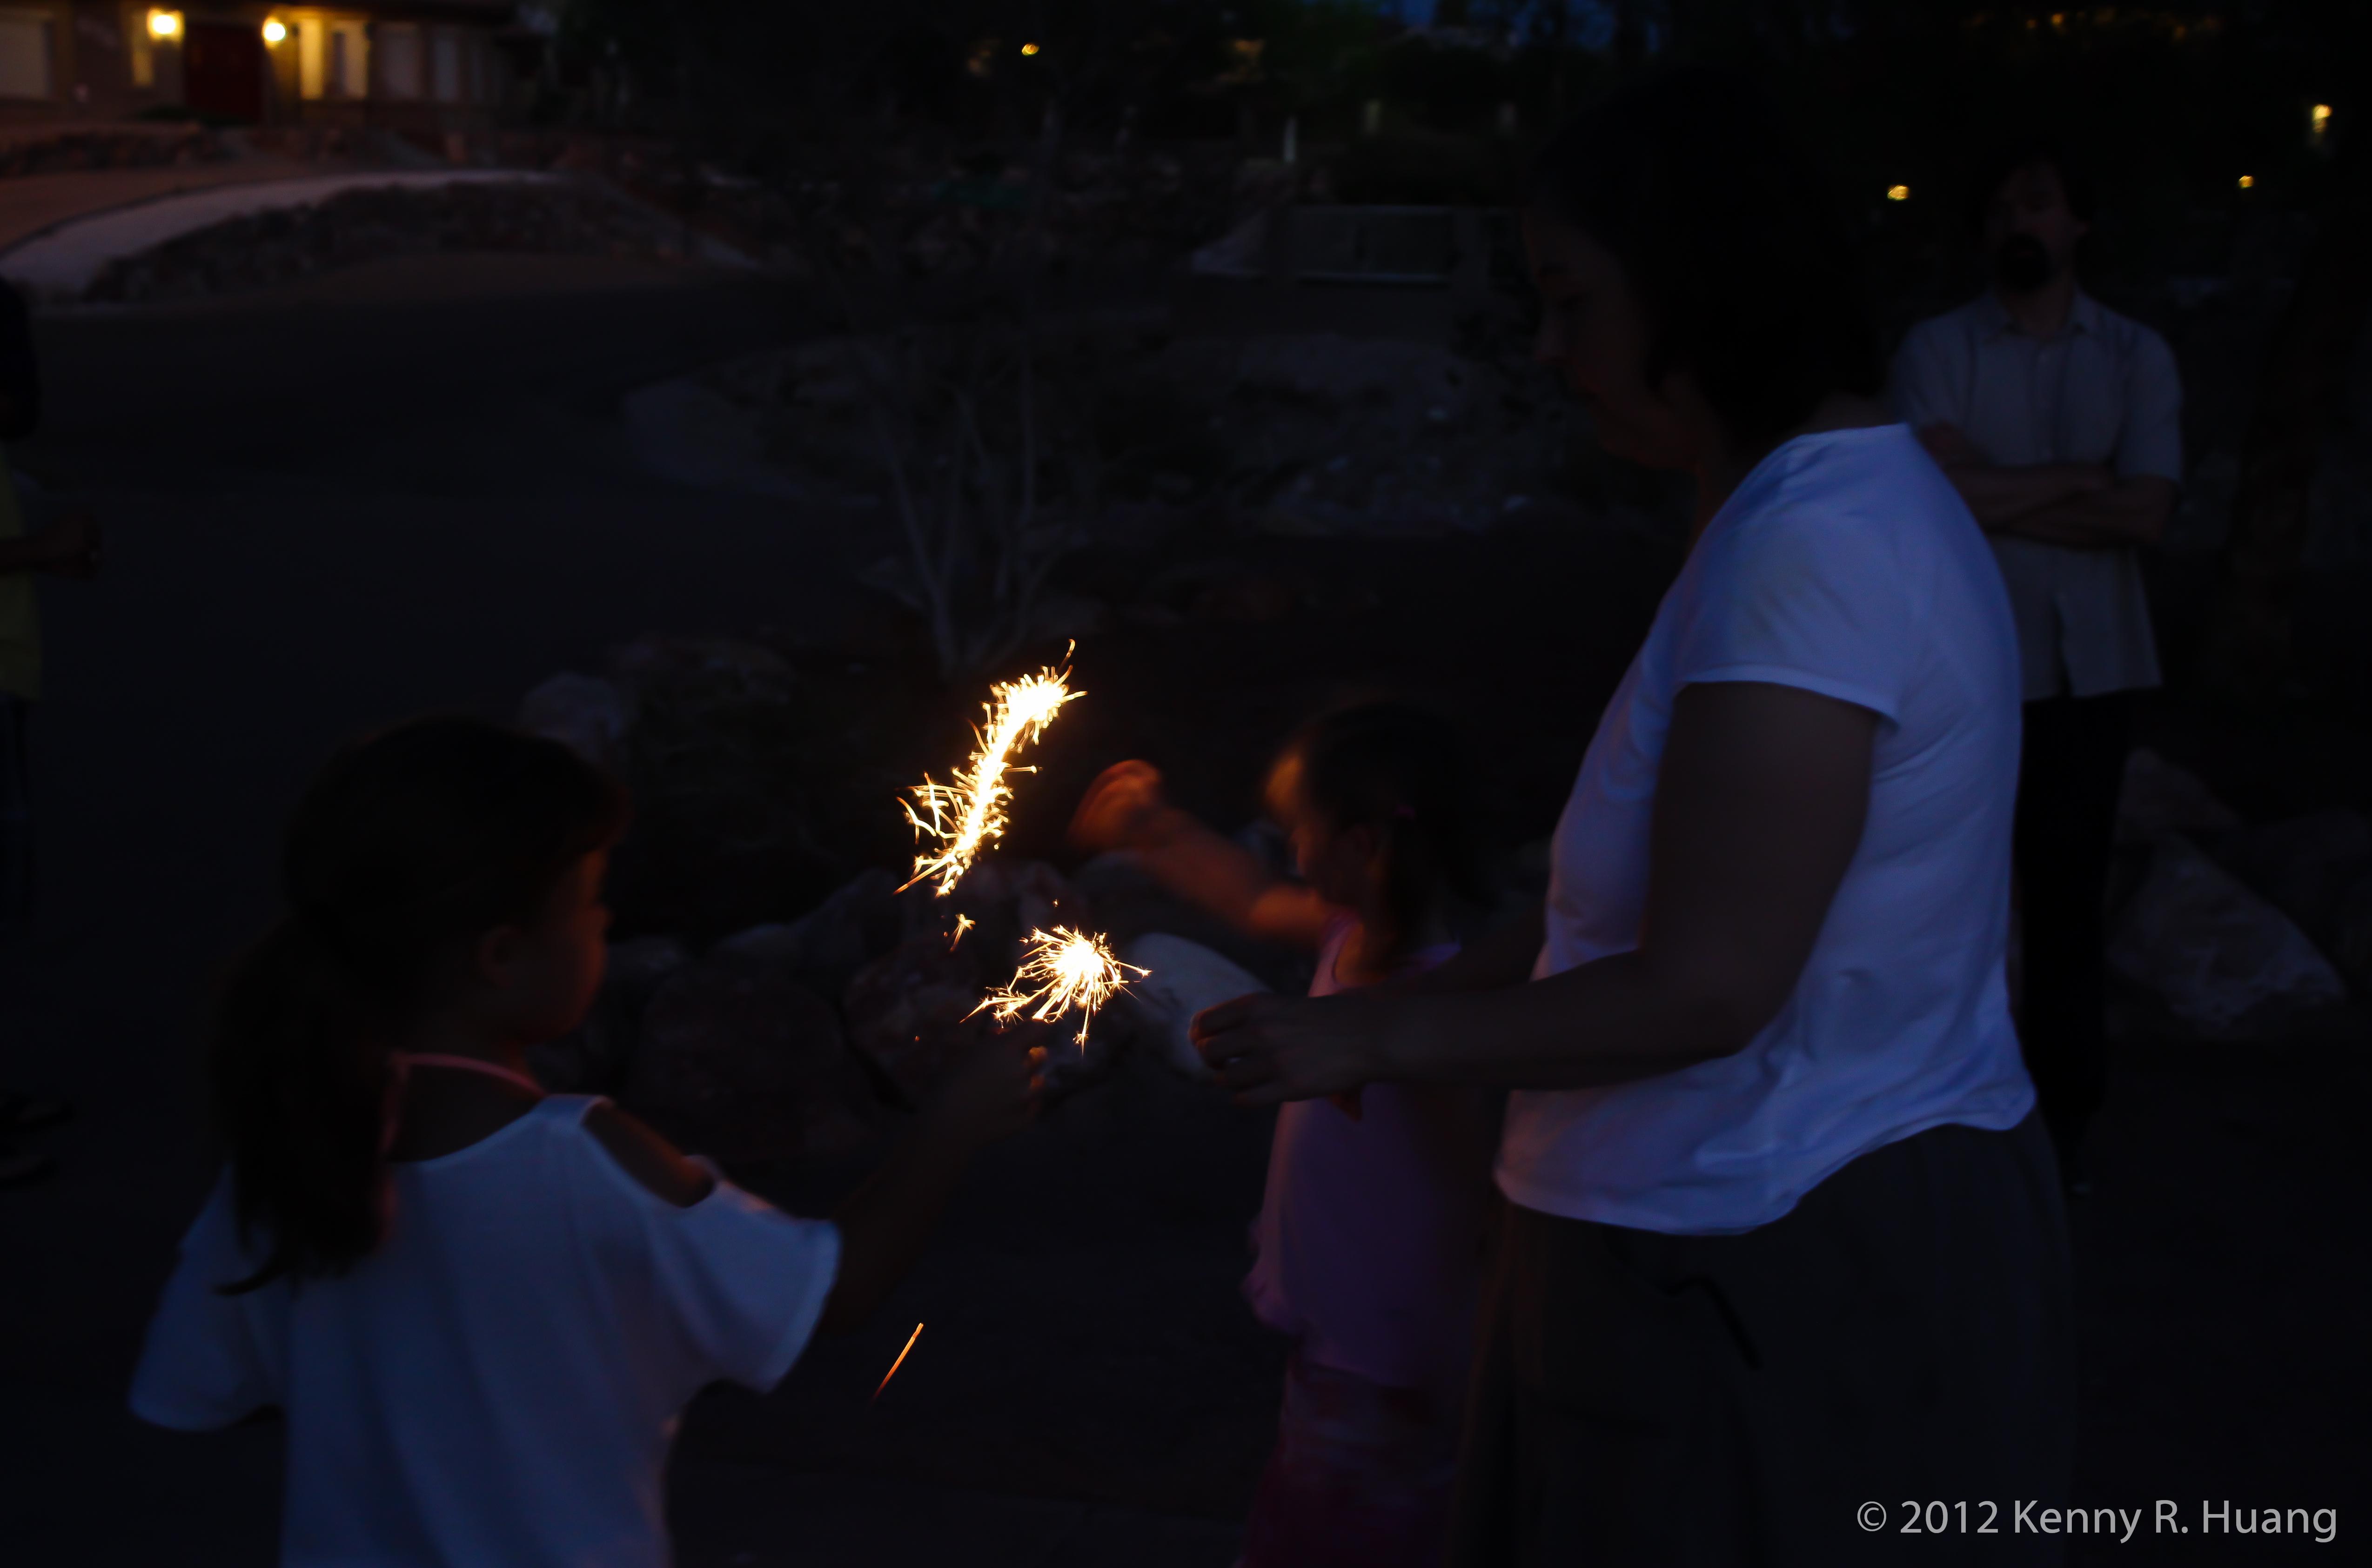 2012-kenny-r-huang-8206